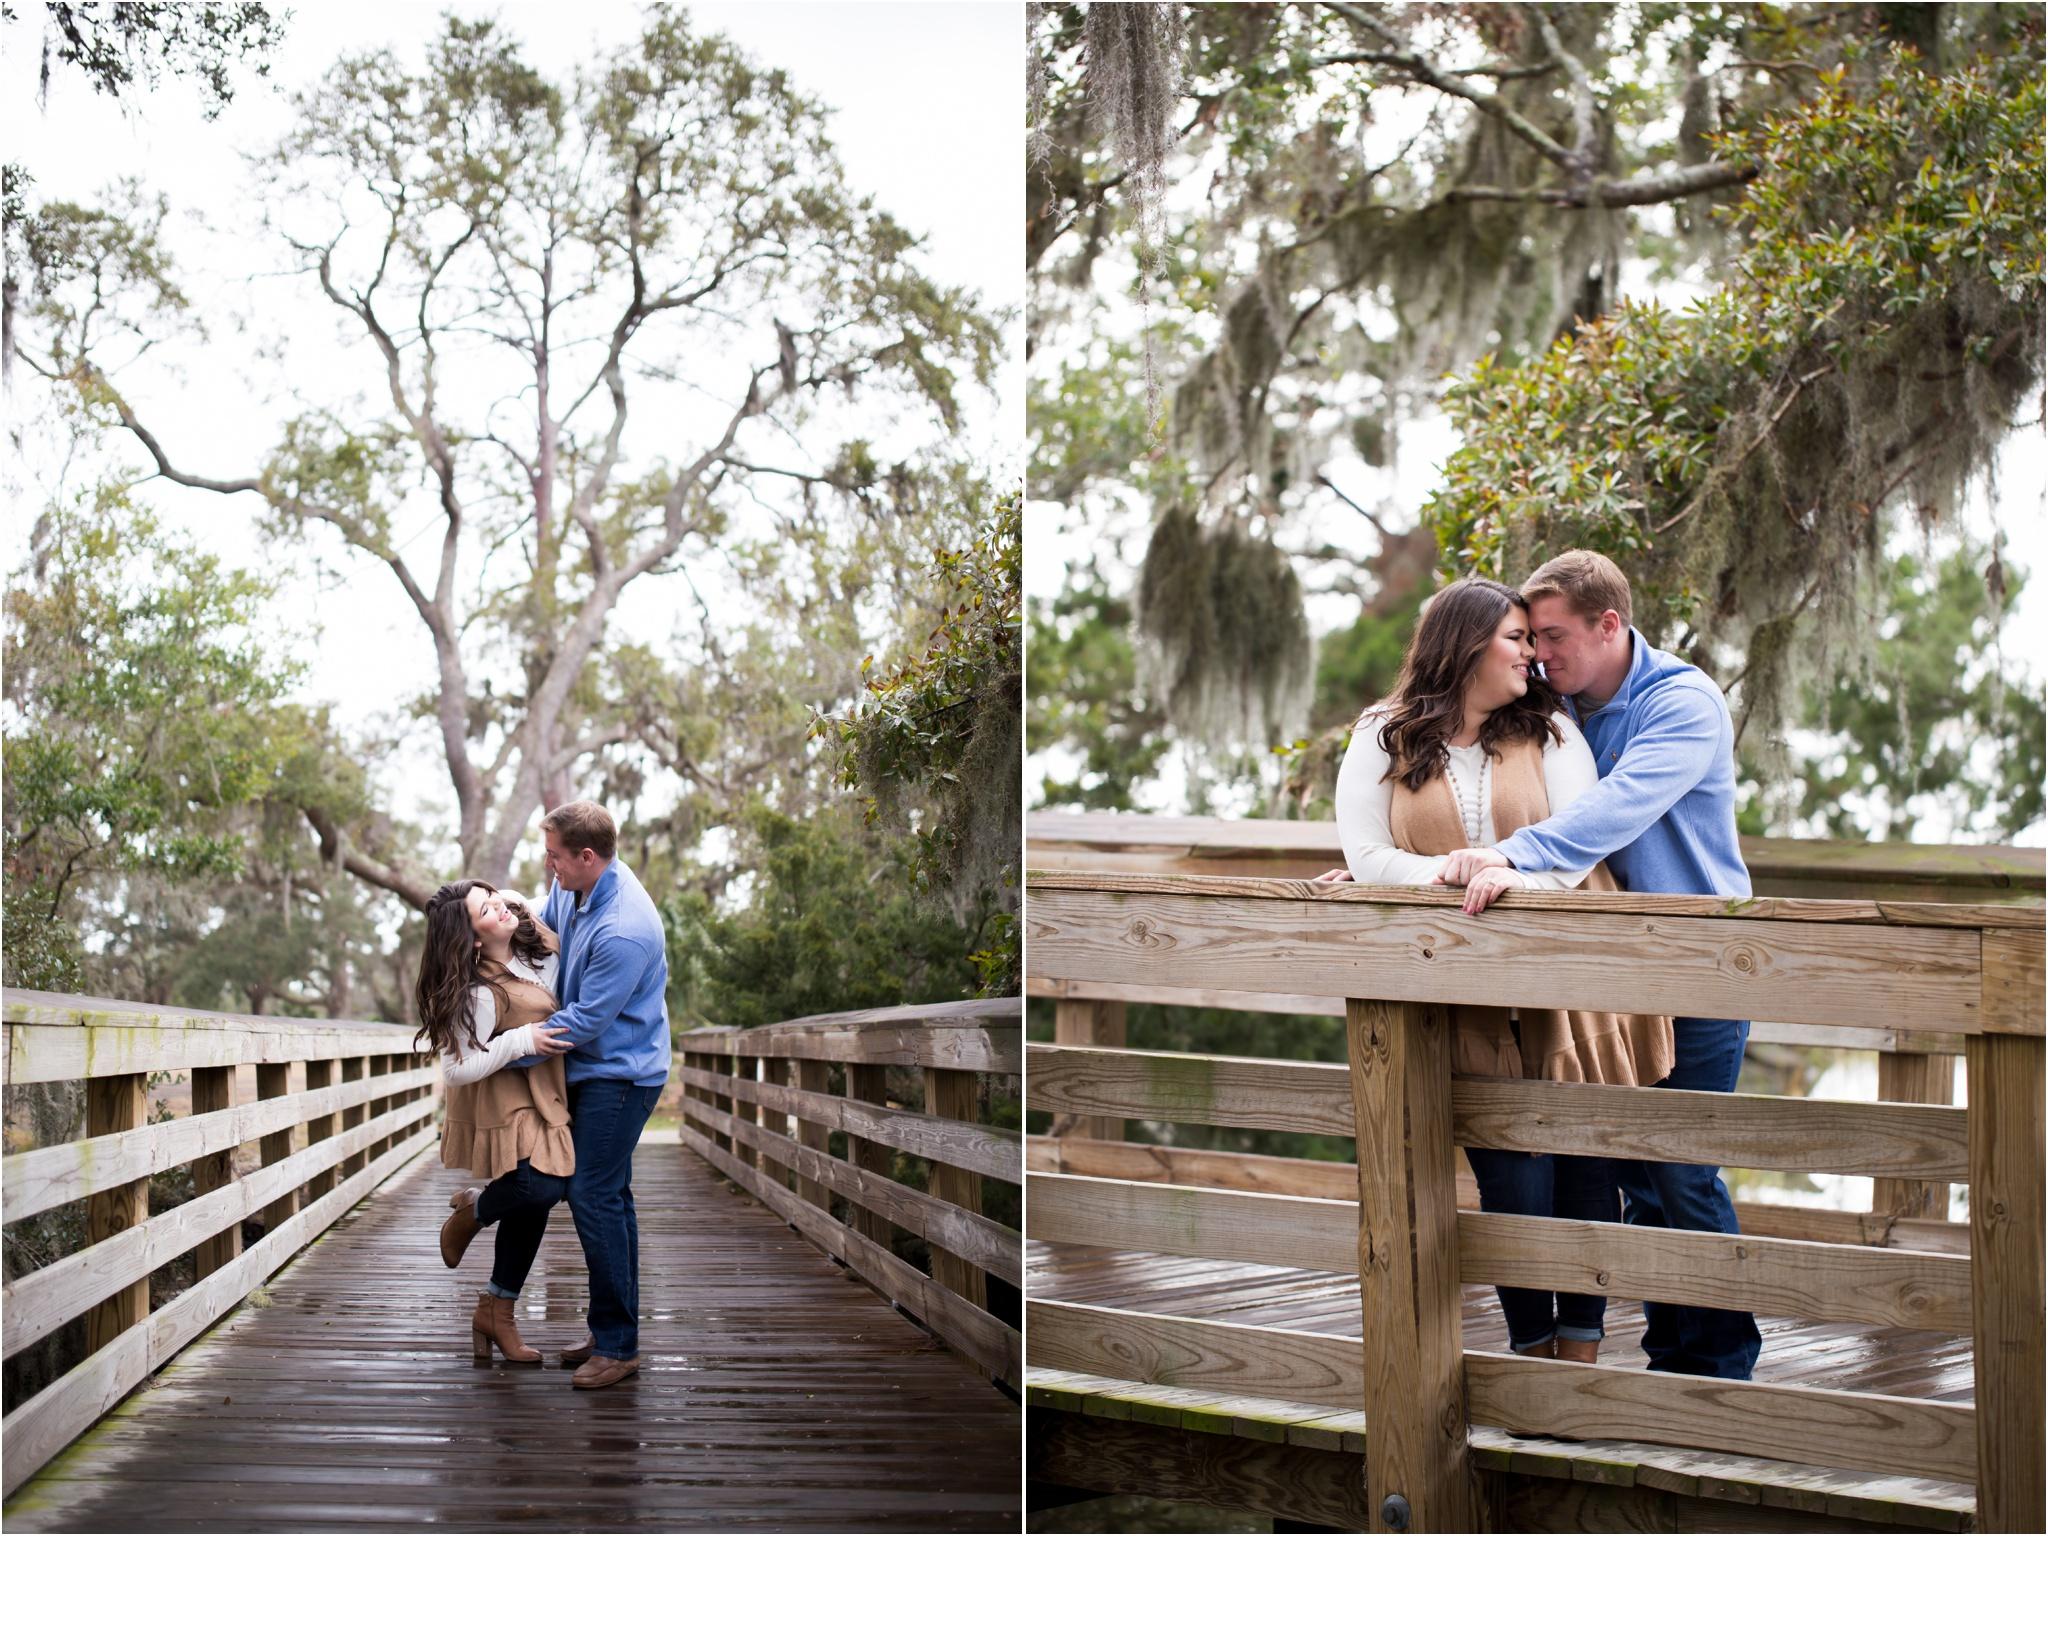 Rainey_Gregg_Photography_St._Simons_Island_Georgia_California_Wedding_Portrait_Photography_0574.jpg